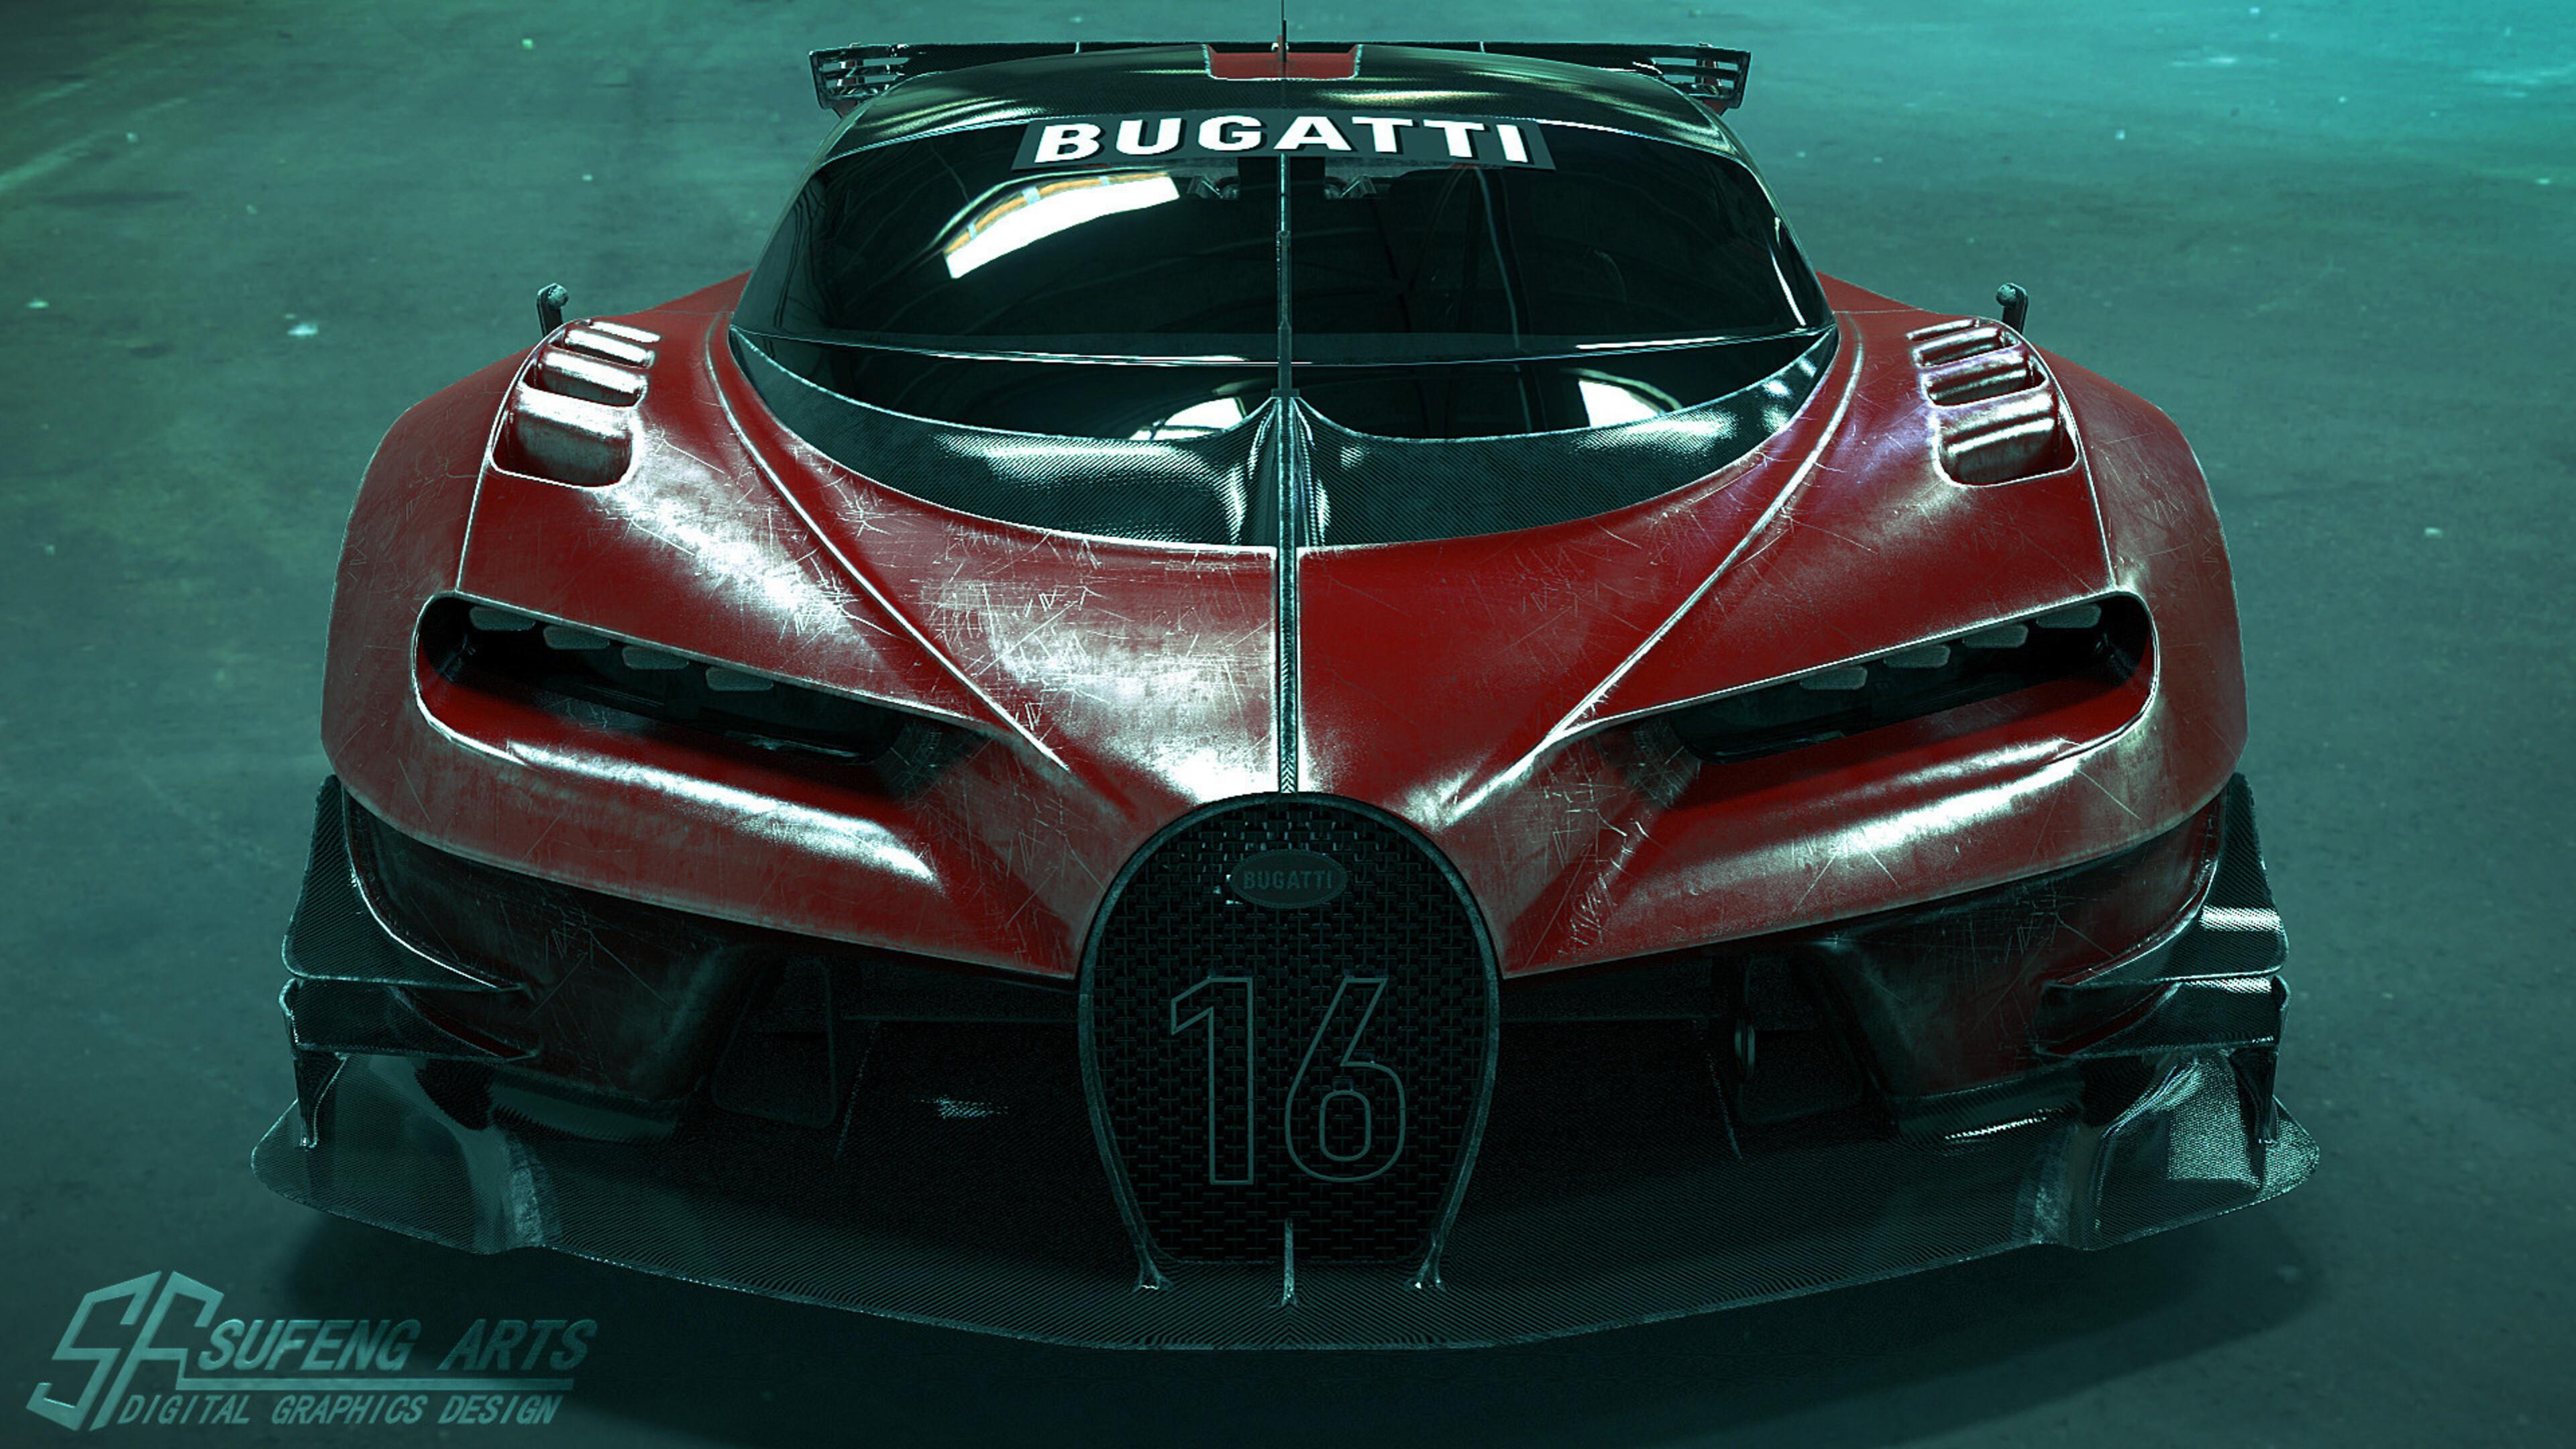 3840x2160 Bugatti 3D 4k HD 4k Wallpapers, Images ...